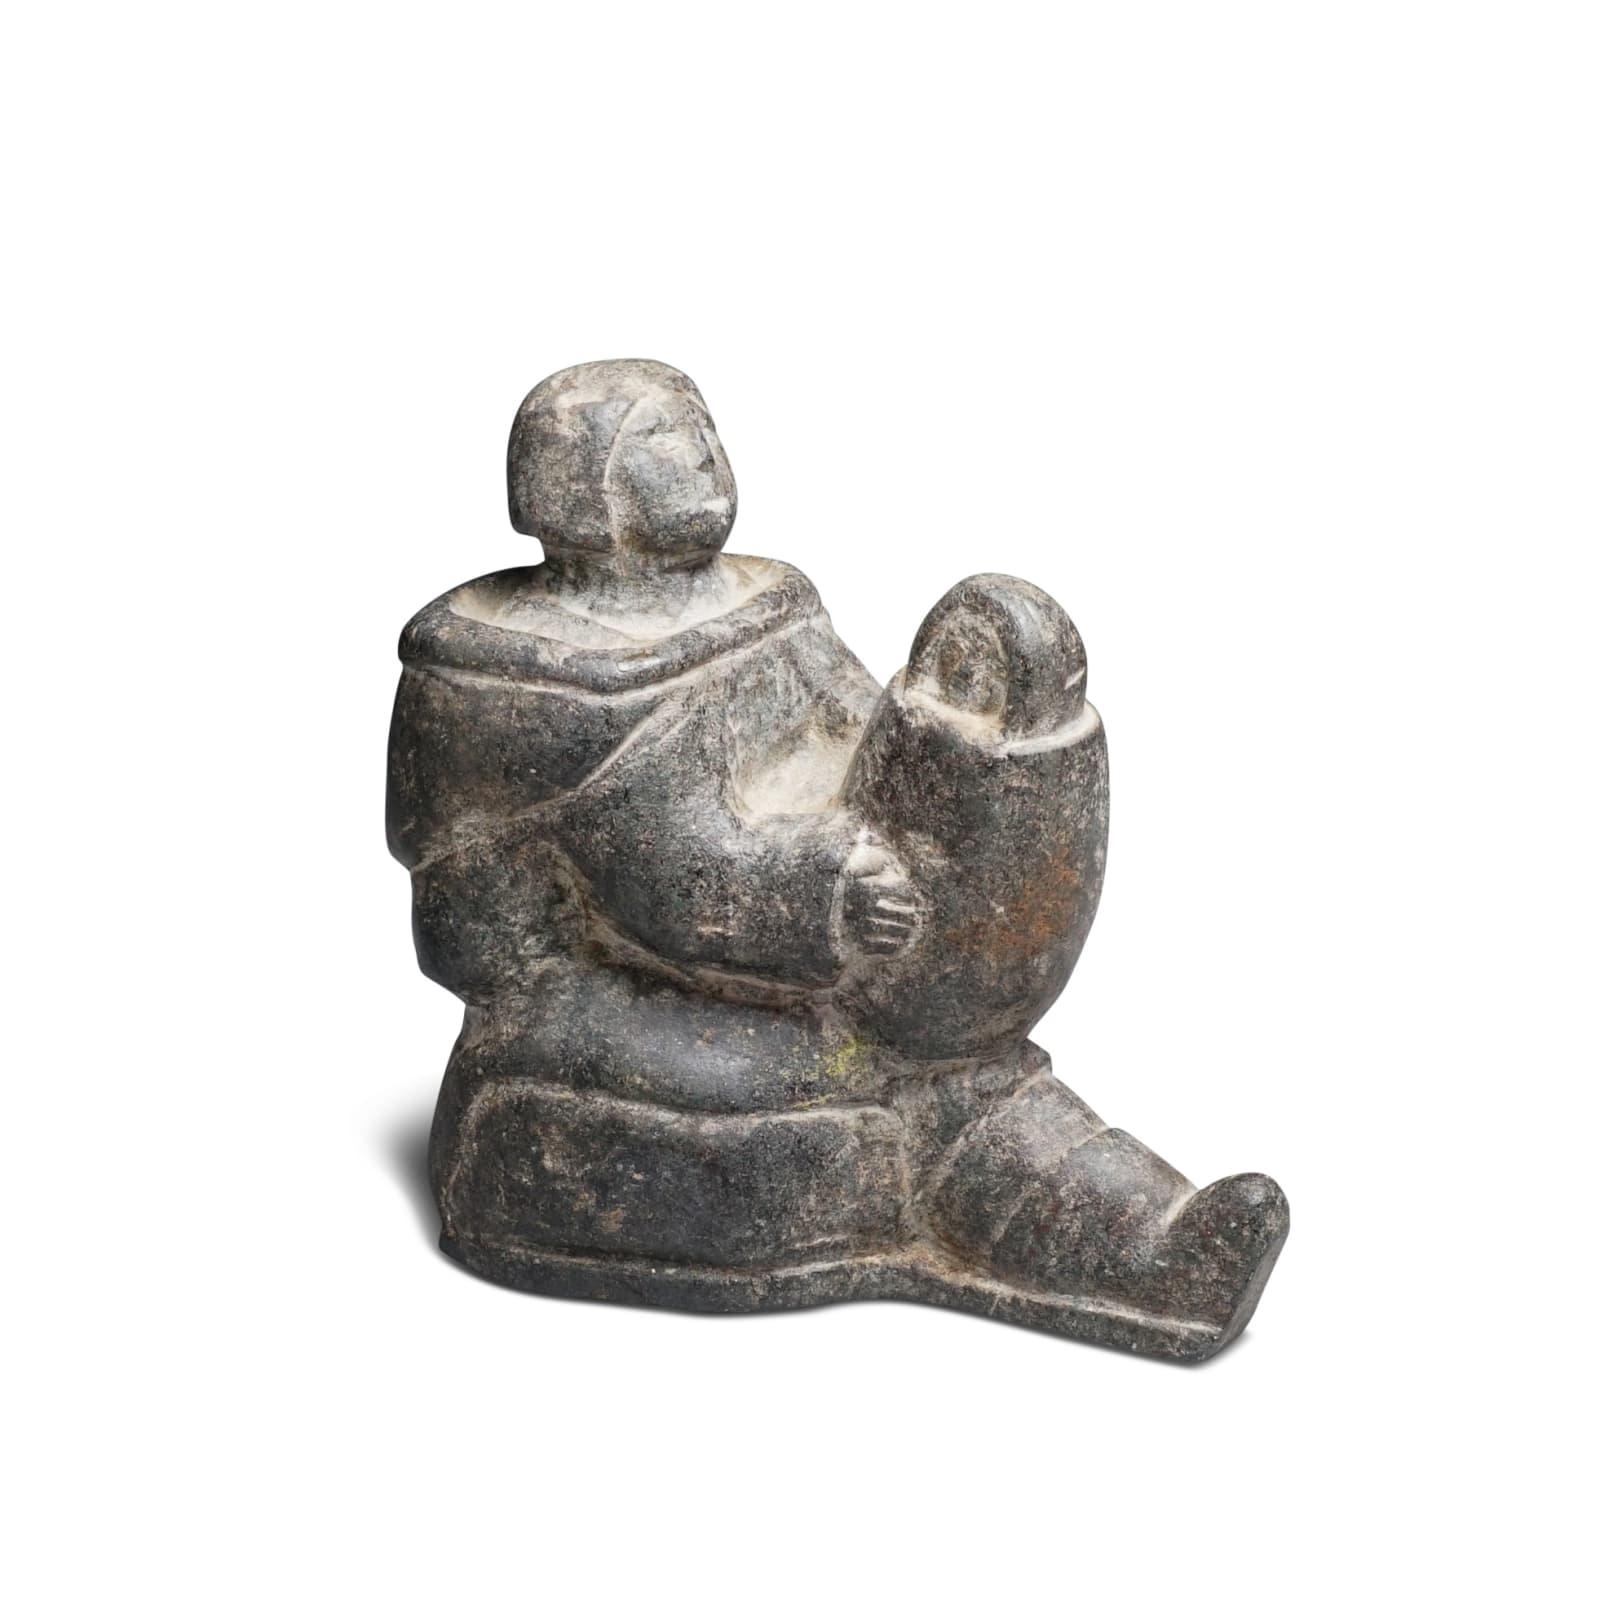 LOT 24  Possibly: MIAIJI UITANGI USAITAIJUK (1911-D), SALLUIT (SUGLUK) Mother Holding Her Swaddled Child, late 1950s stone, 5 x 2 1/2 x 4 1/2 in (12.7 x 6.3 x 11.4 cm)  ESTIMATE: $500 — $700